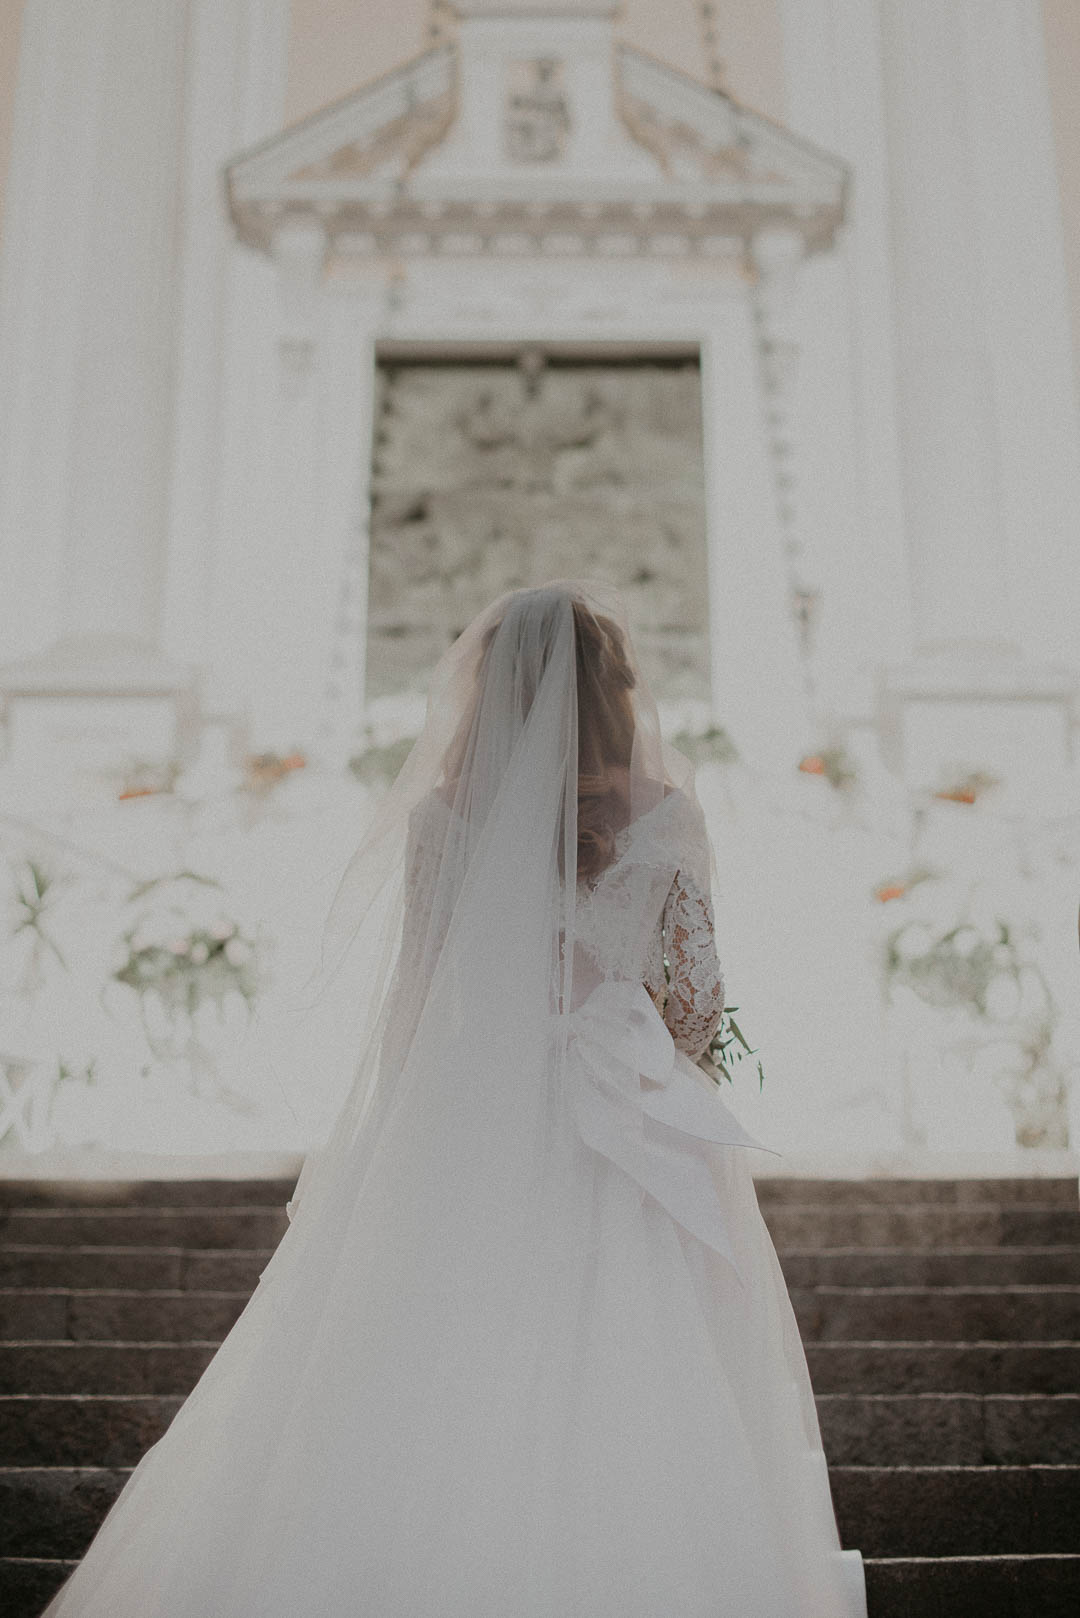 wedding-photographer-destination-fineart-bespoke-reportage-napoli-nabilah-vivianeizzo-spazio46-54